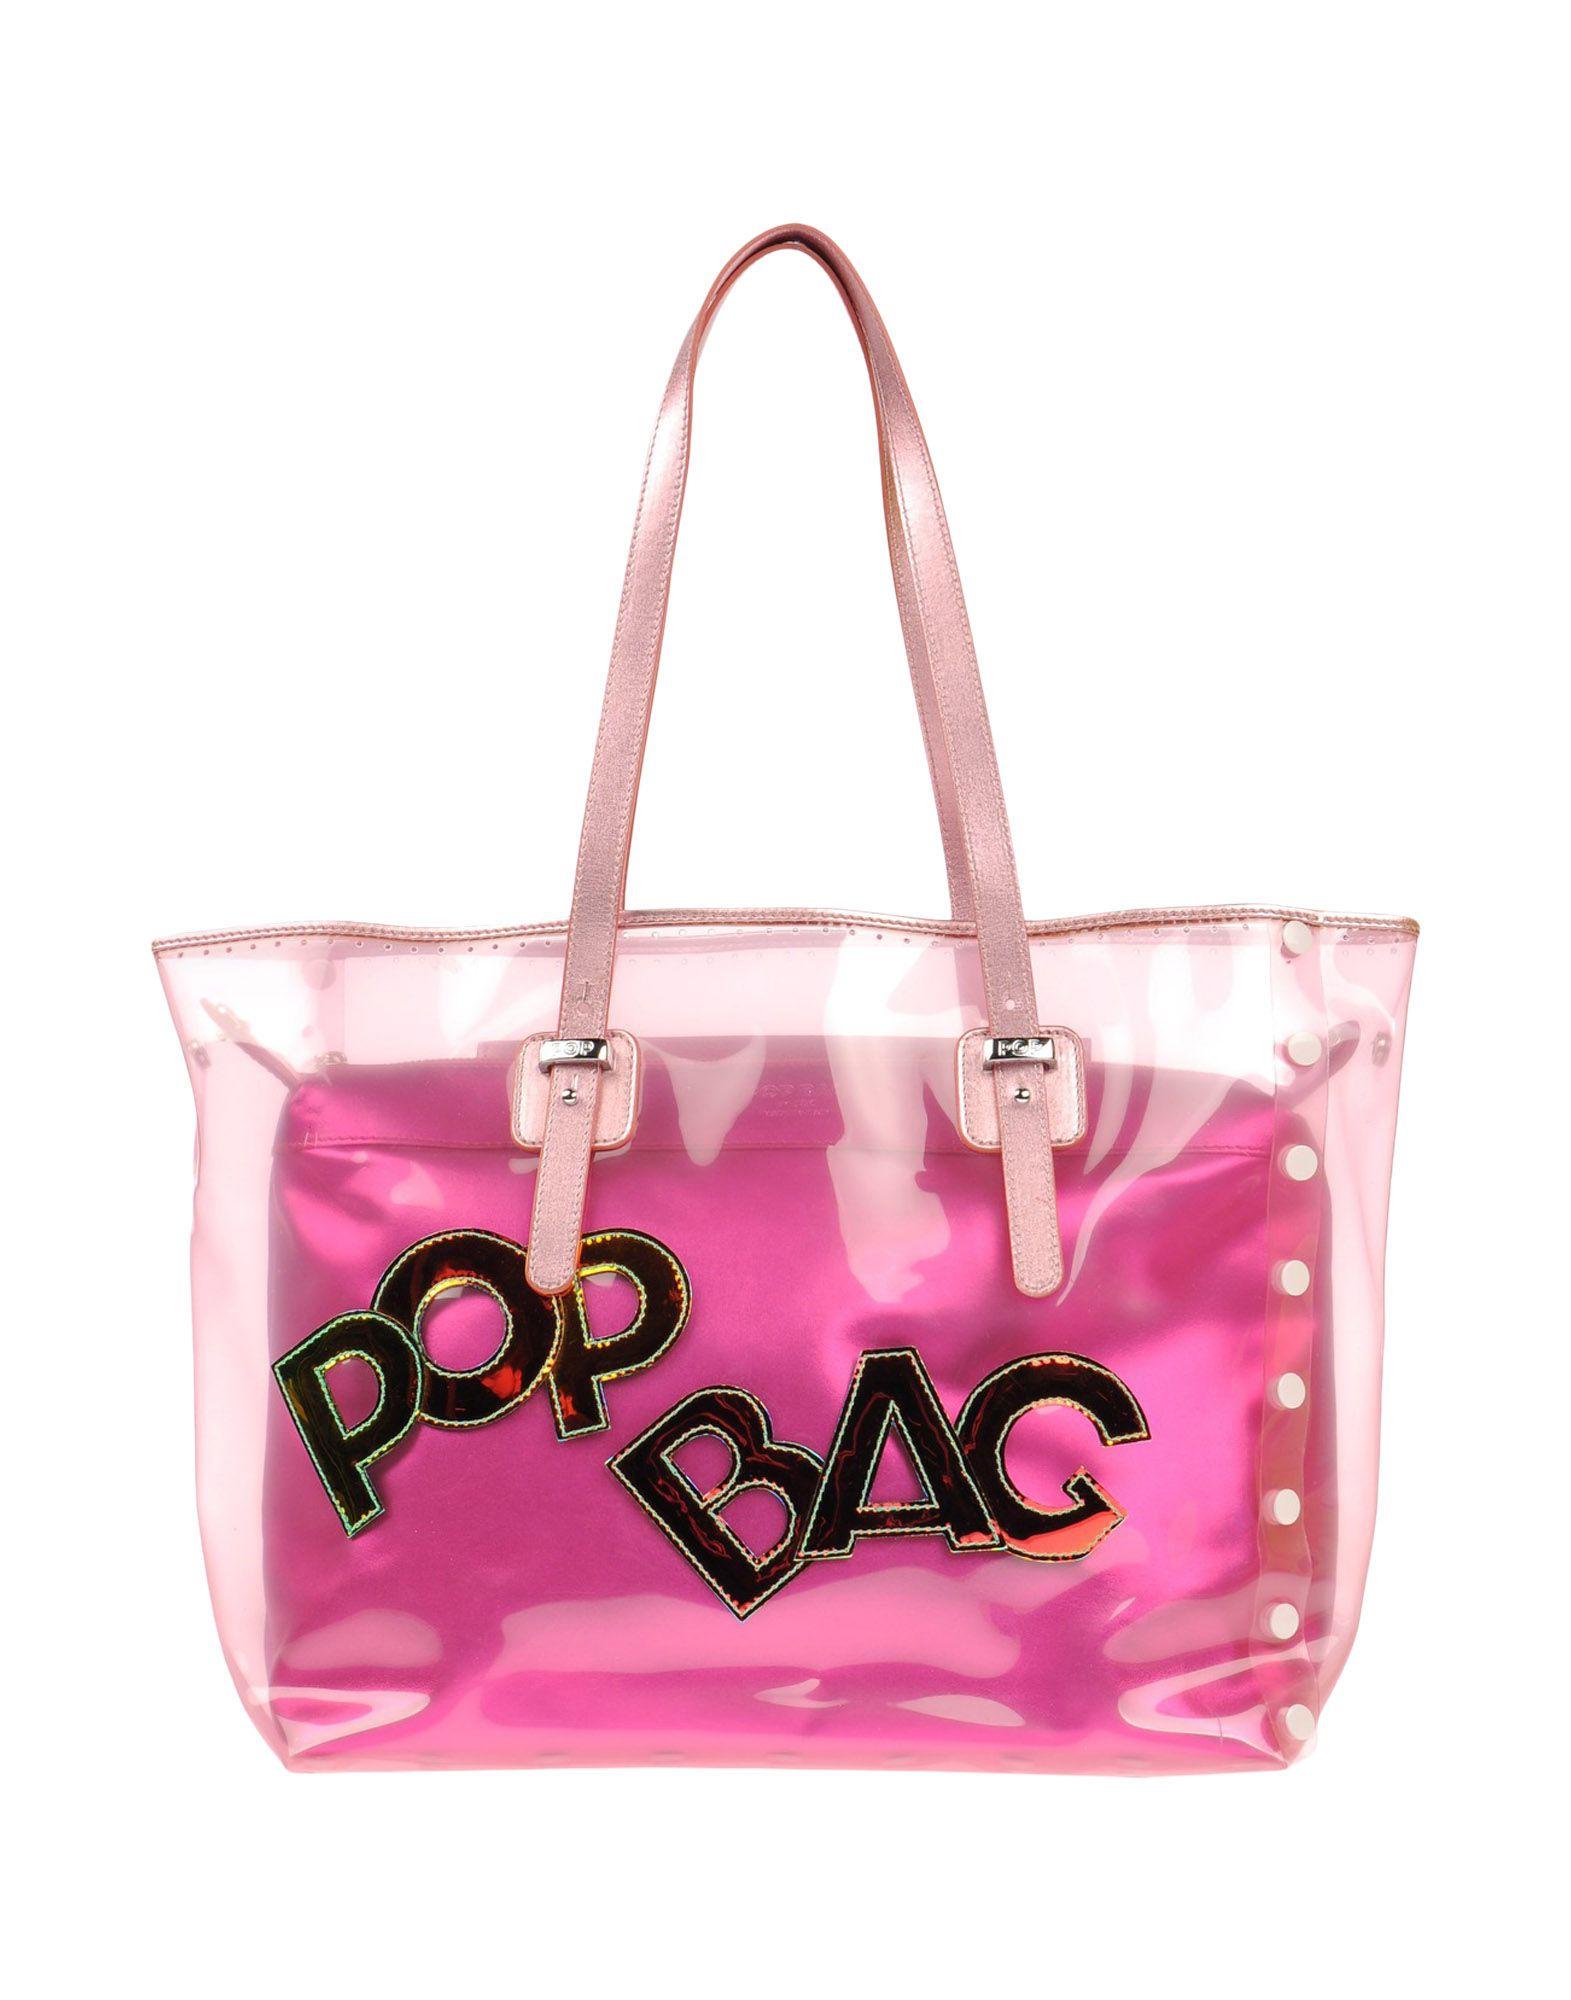 POP BAG by J&C Сумка на руку iggy pop iggy pop rock action 2 lp